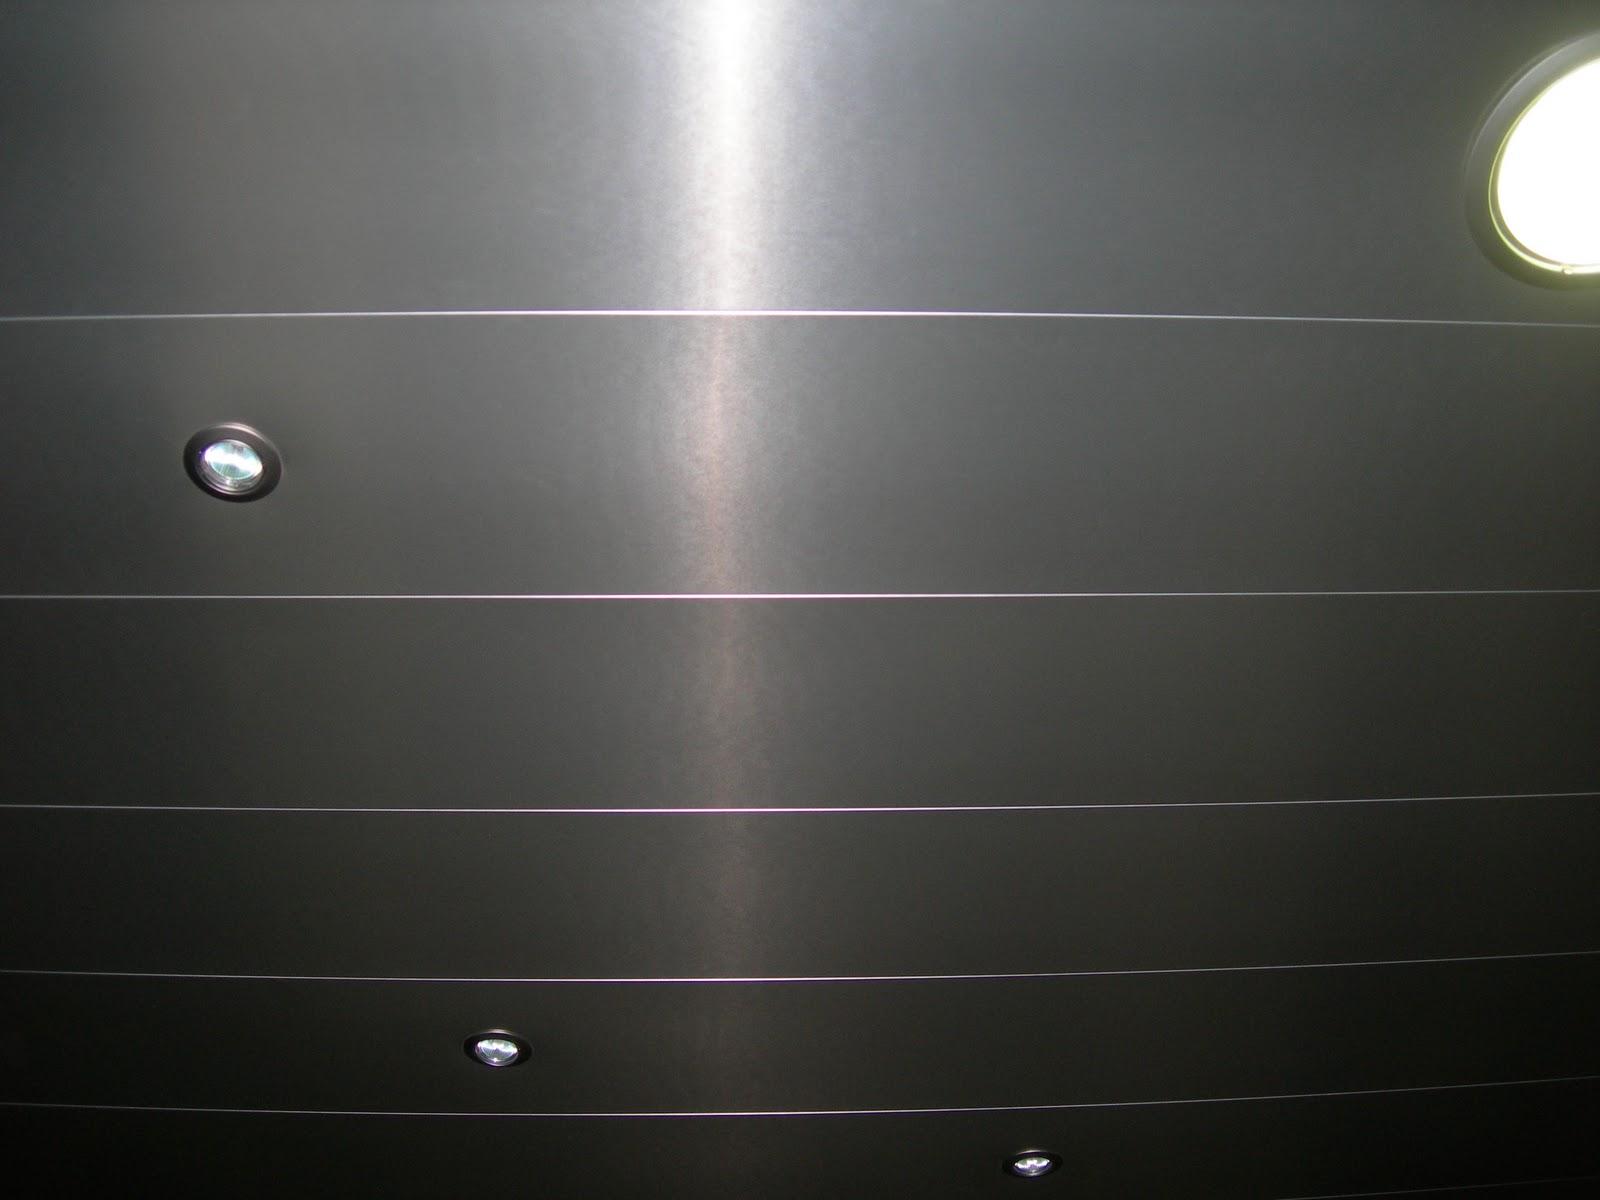 Toldos campos techos de aluminio for Materiales para toldos de aluminio